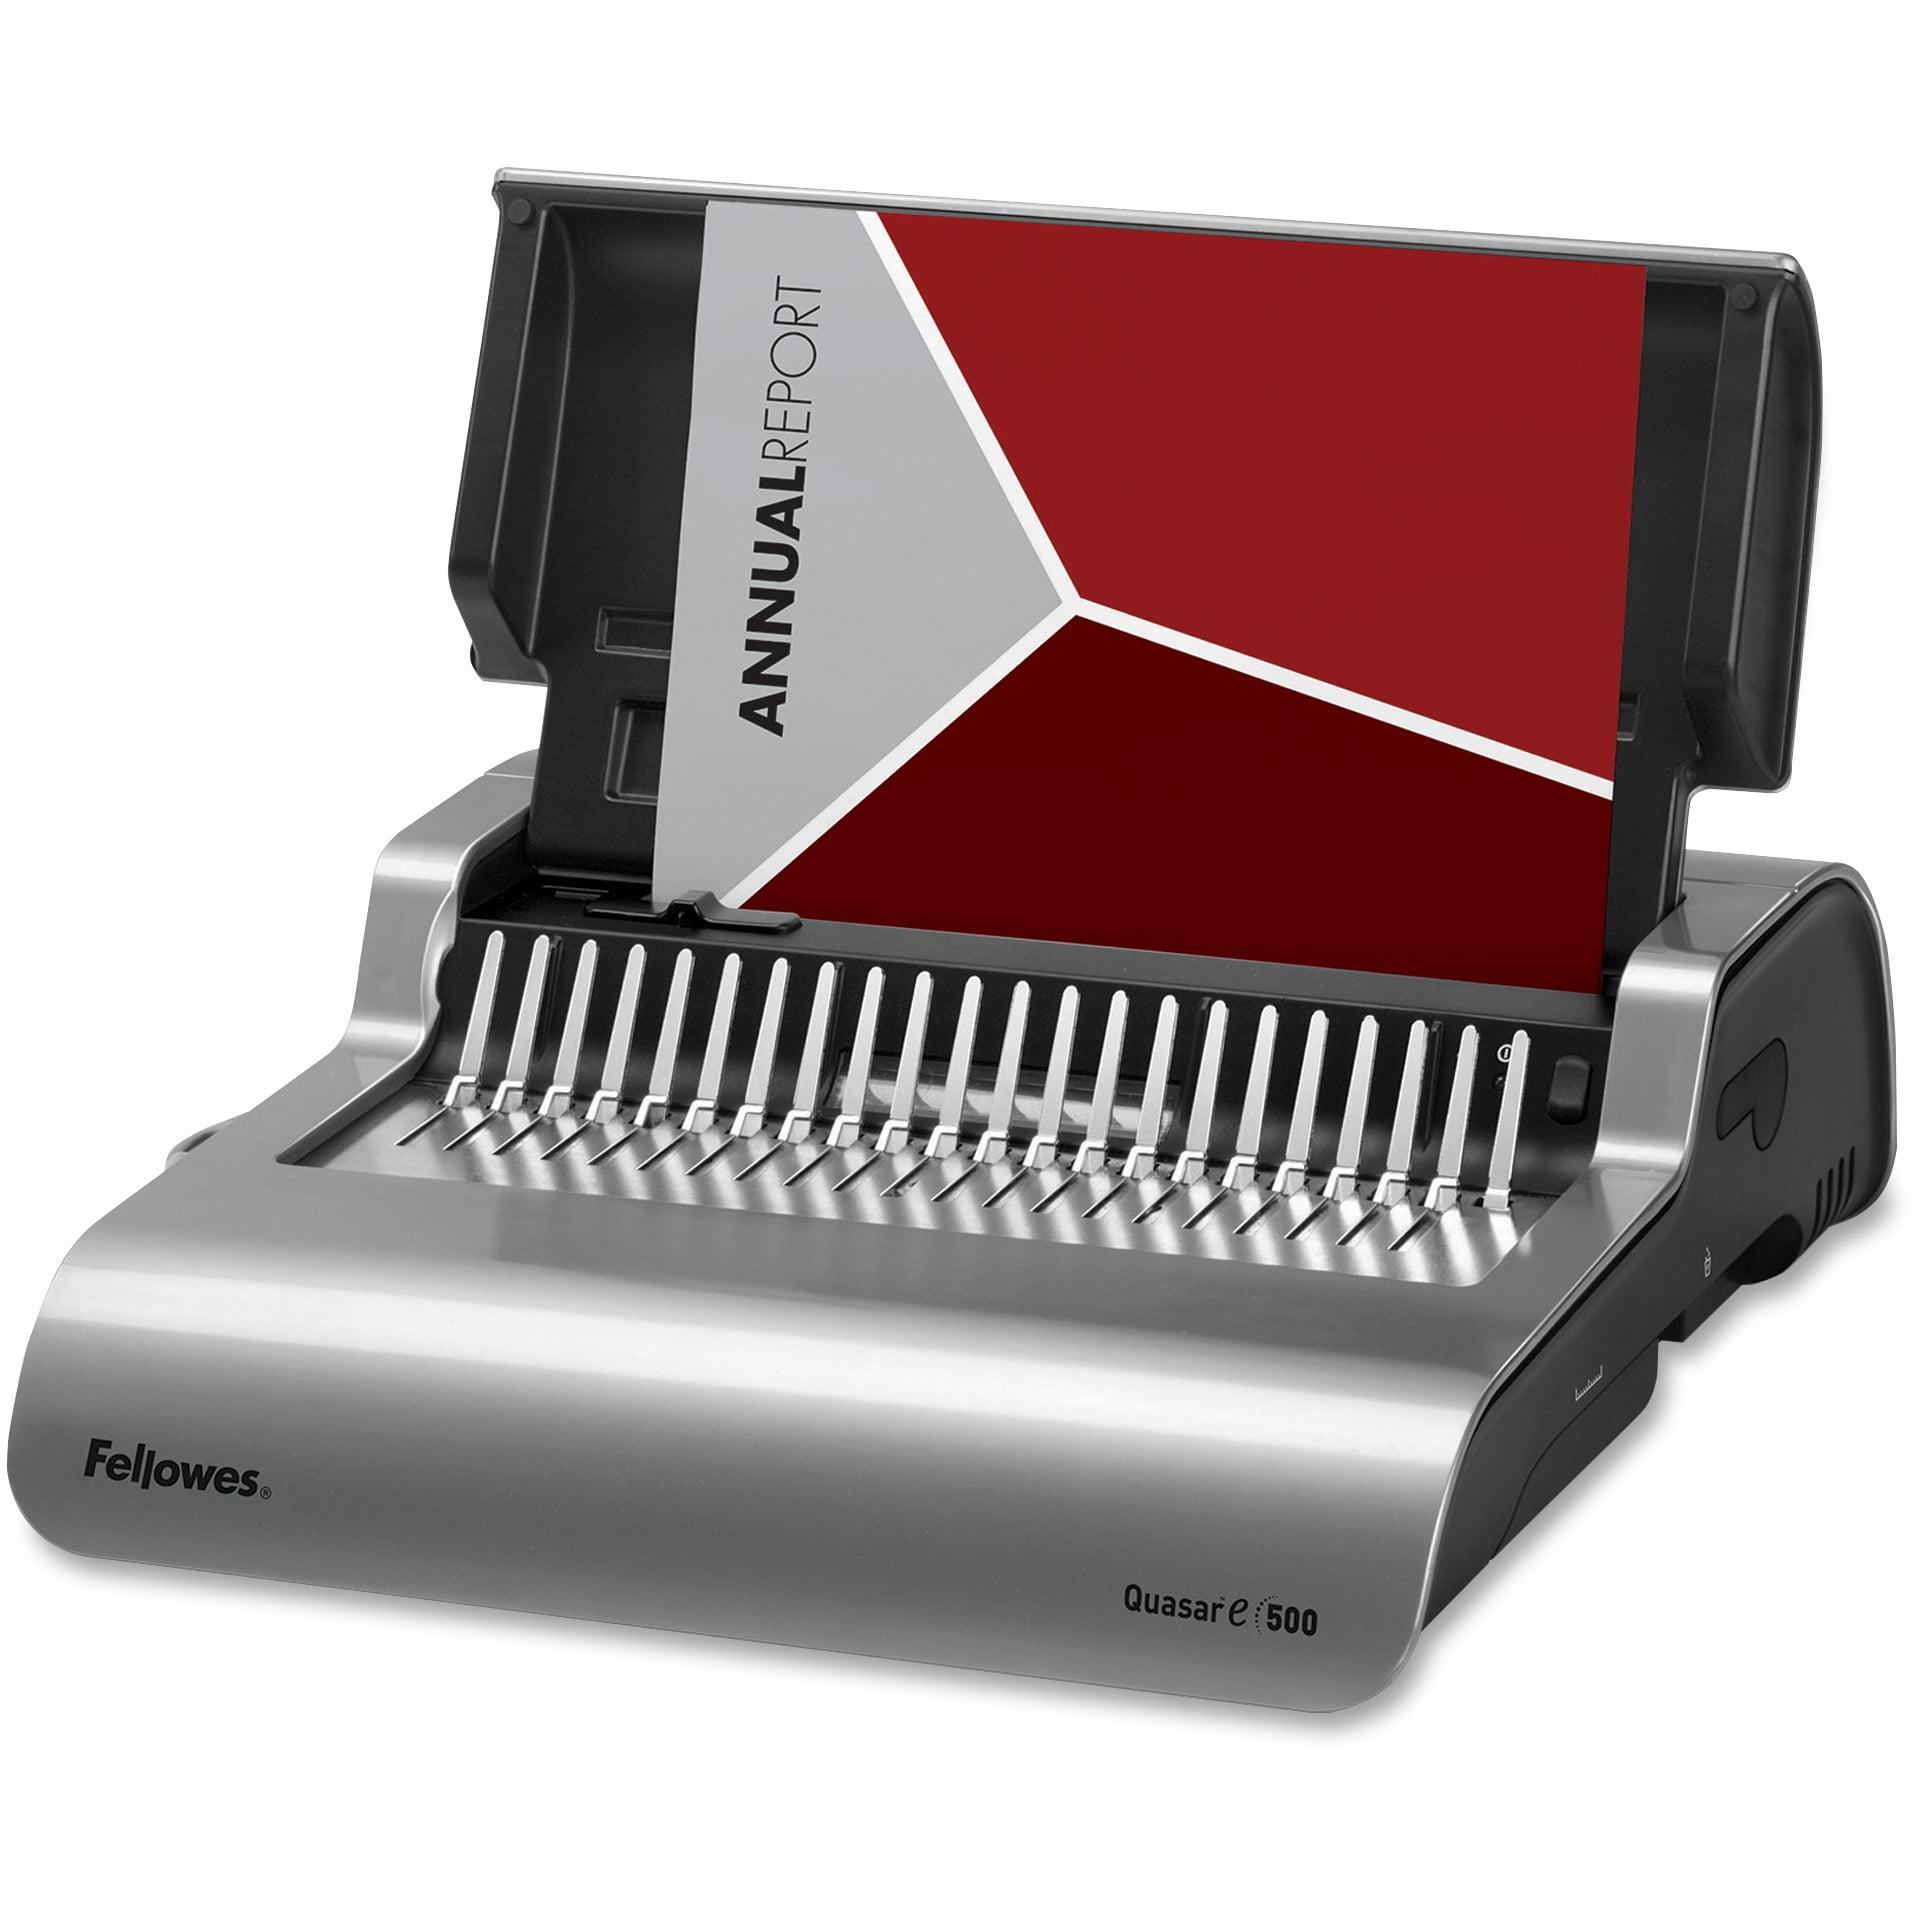 Fellowes Quasar E500 Electric Comb Binding Machine, Metallic Silver, Black by Fellowes, Inc